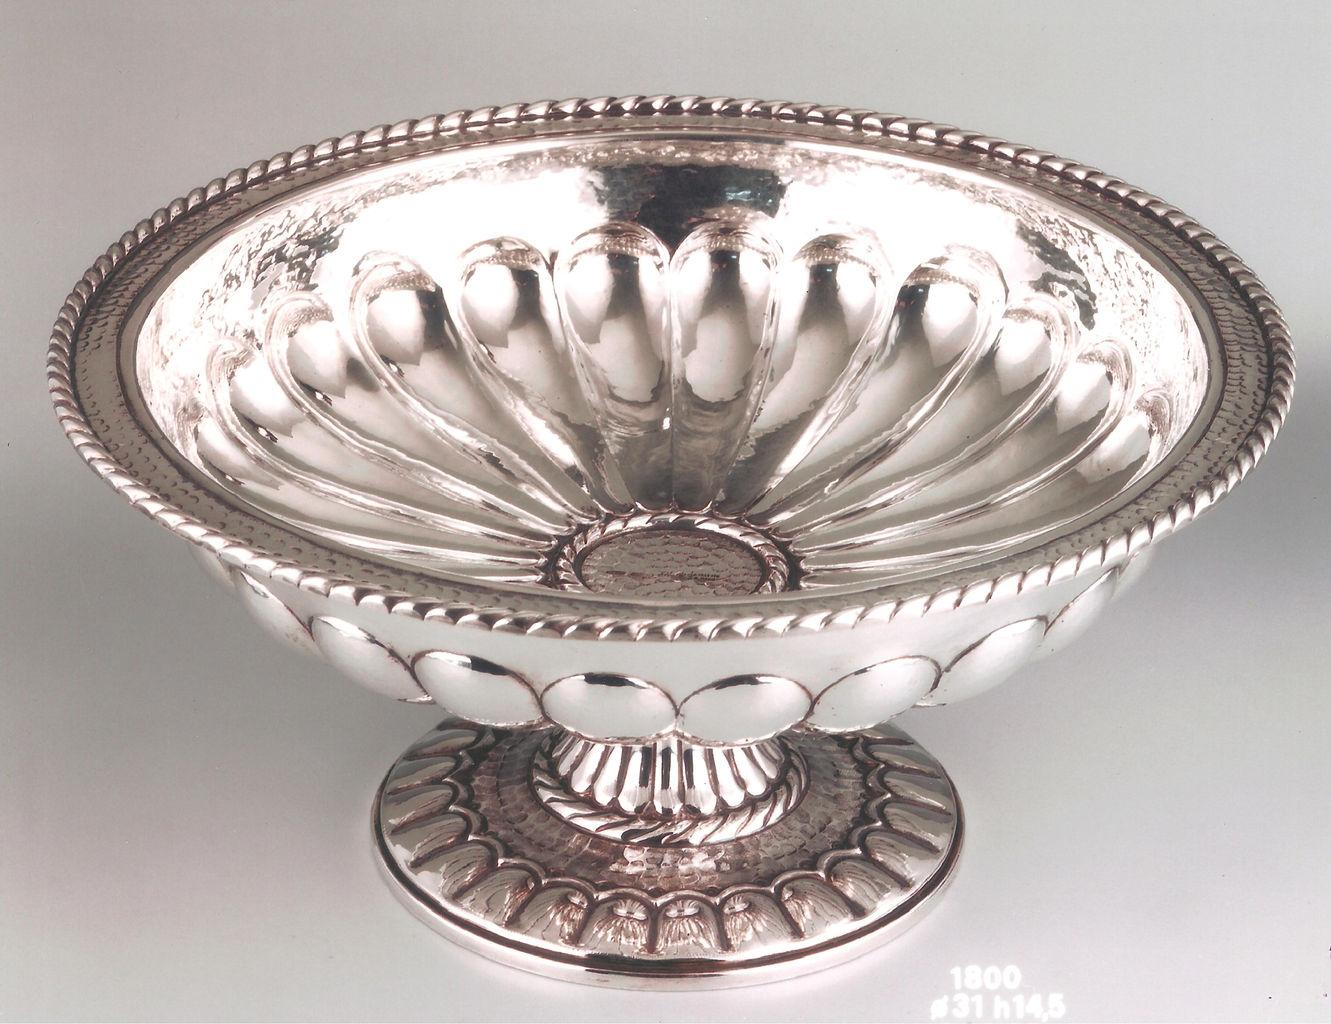 Argenteria scaffei firenze argenteria firenze per la - Centrotavola argento moderno ...